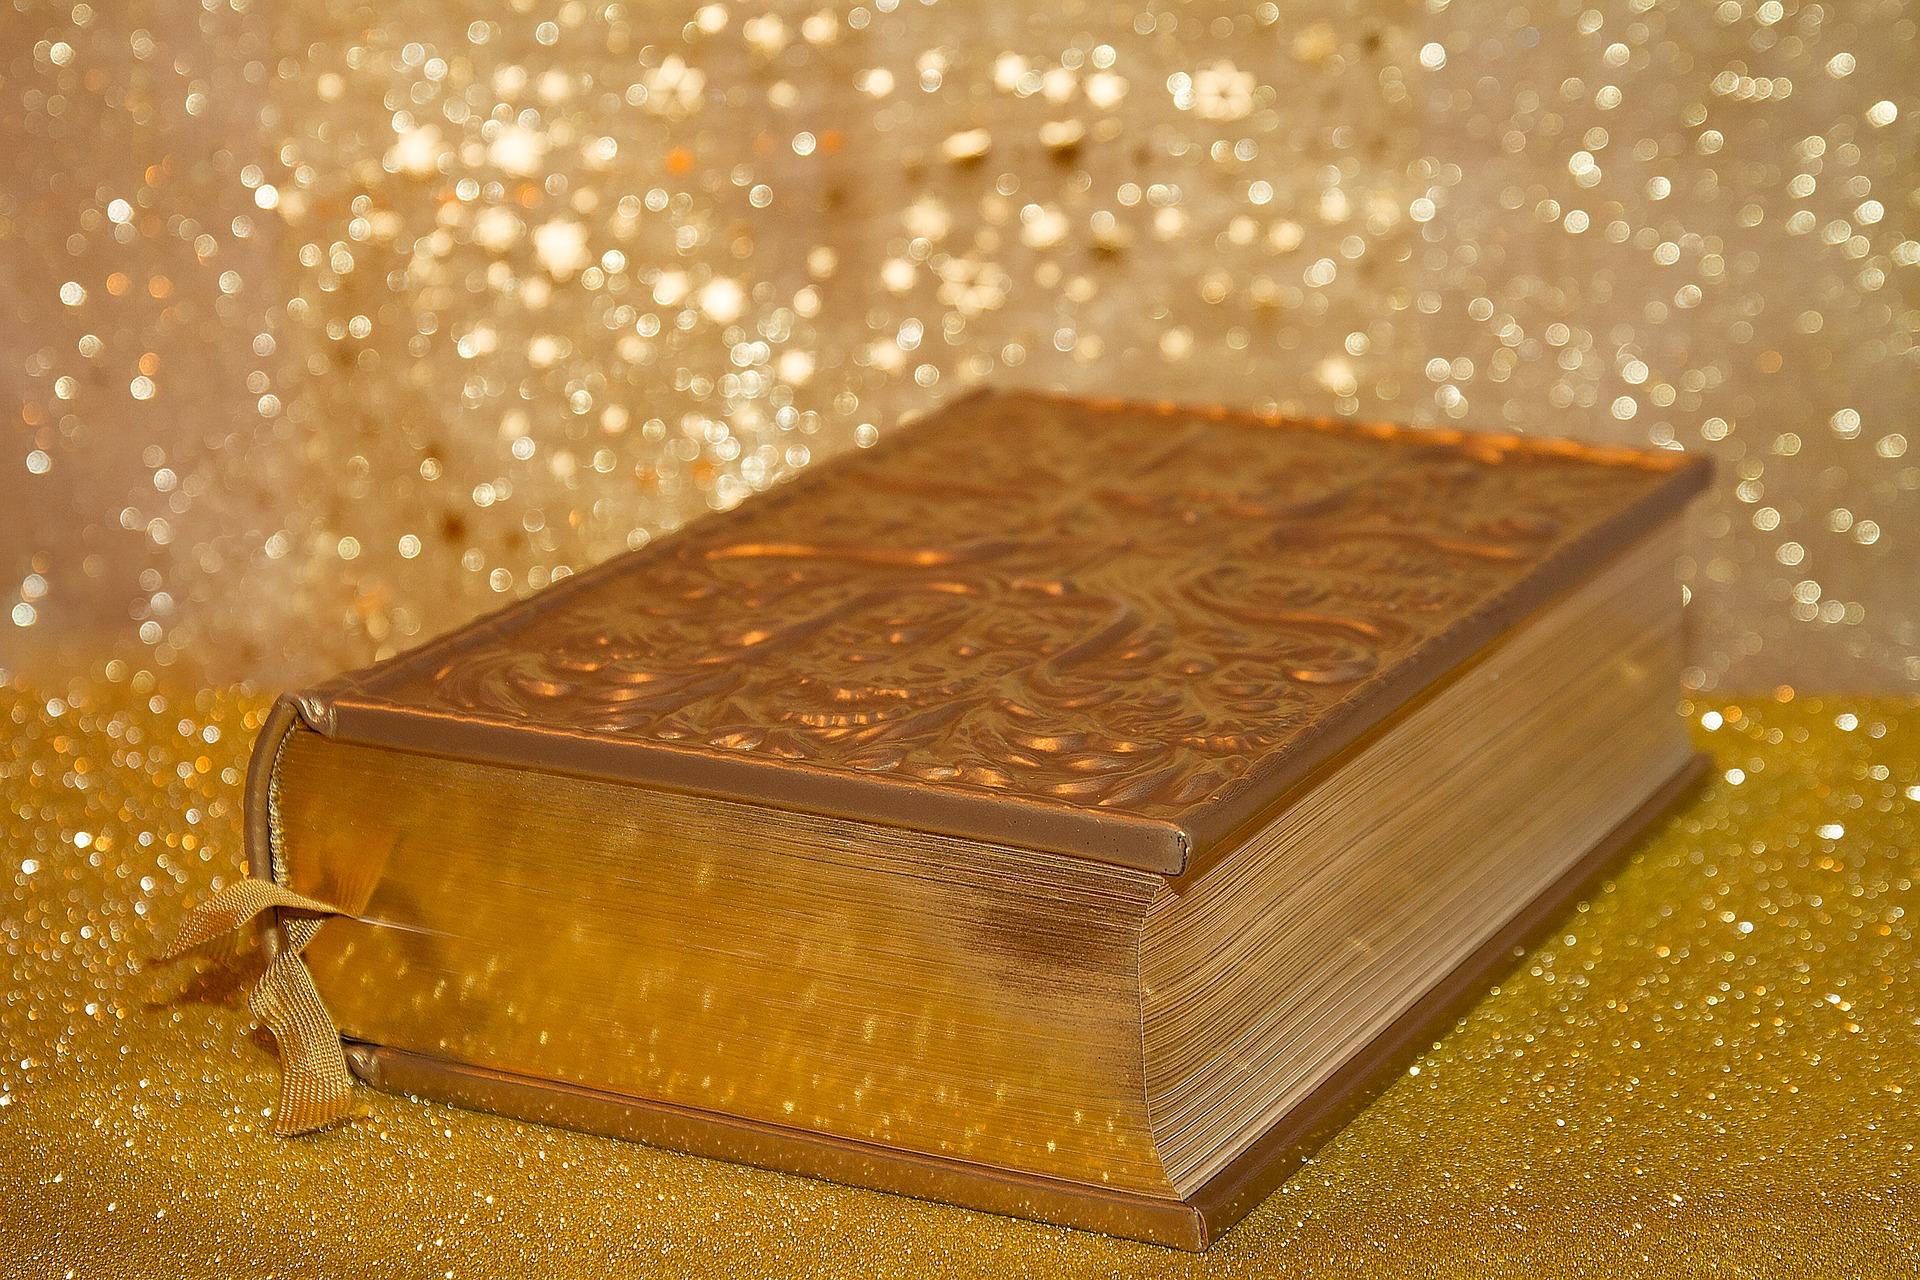 Berufung in der Bibel